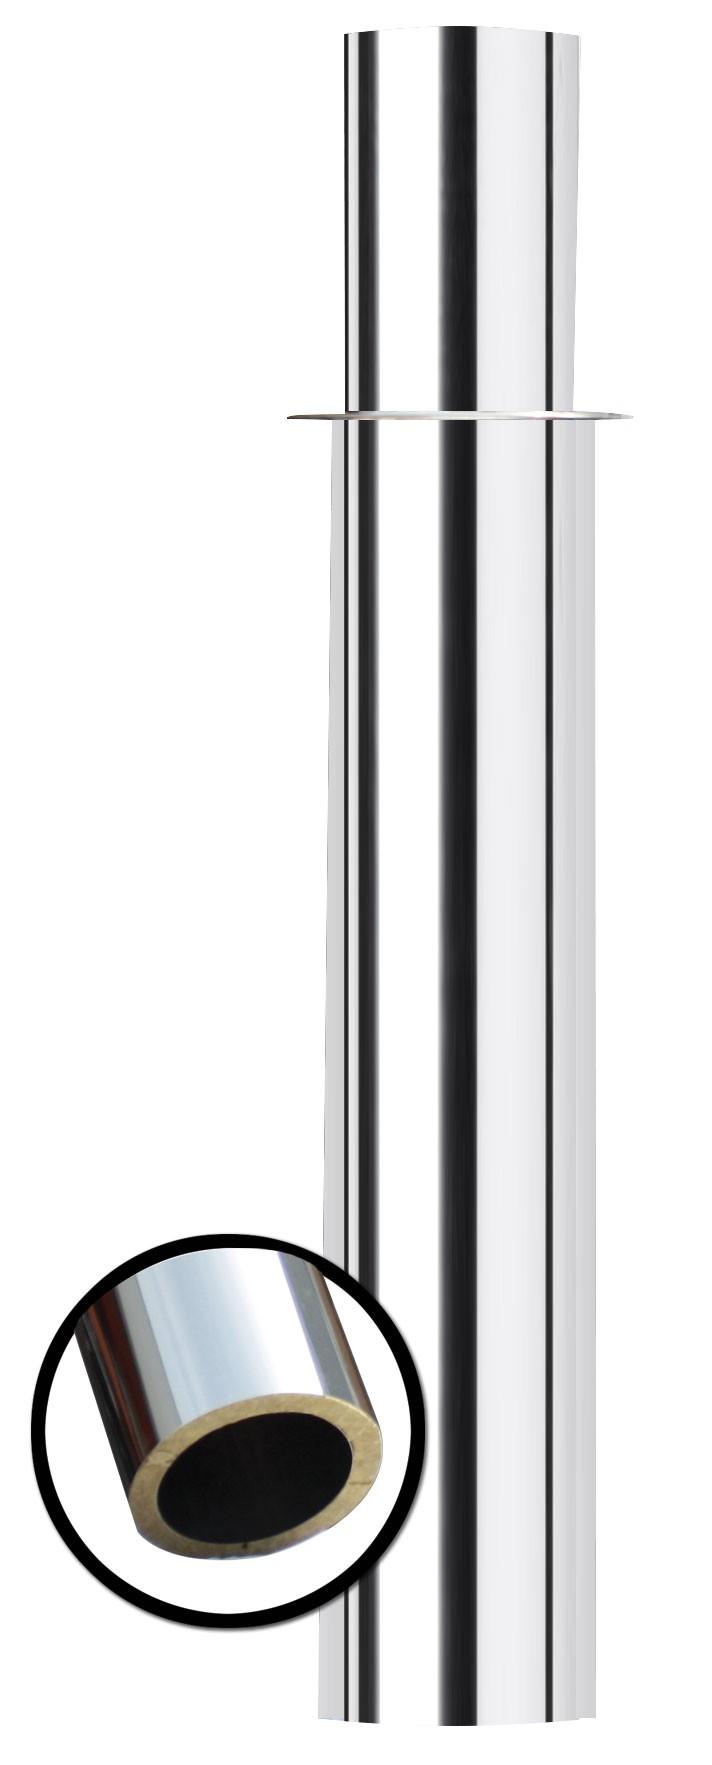 Verlängerungselement Edelstahl ohne Windkat 1000 mm Ø 150 mm Bild 1